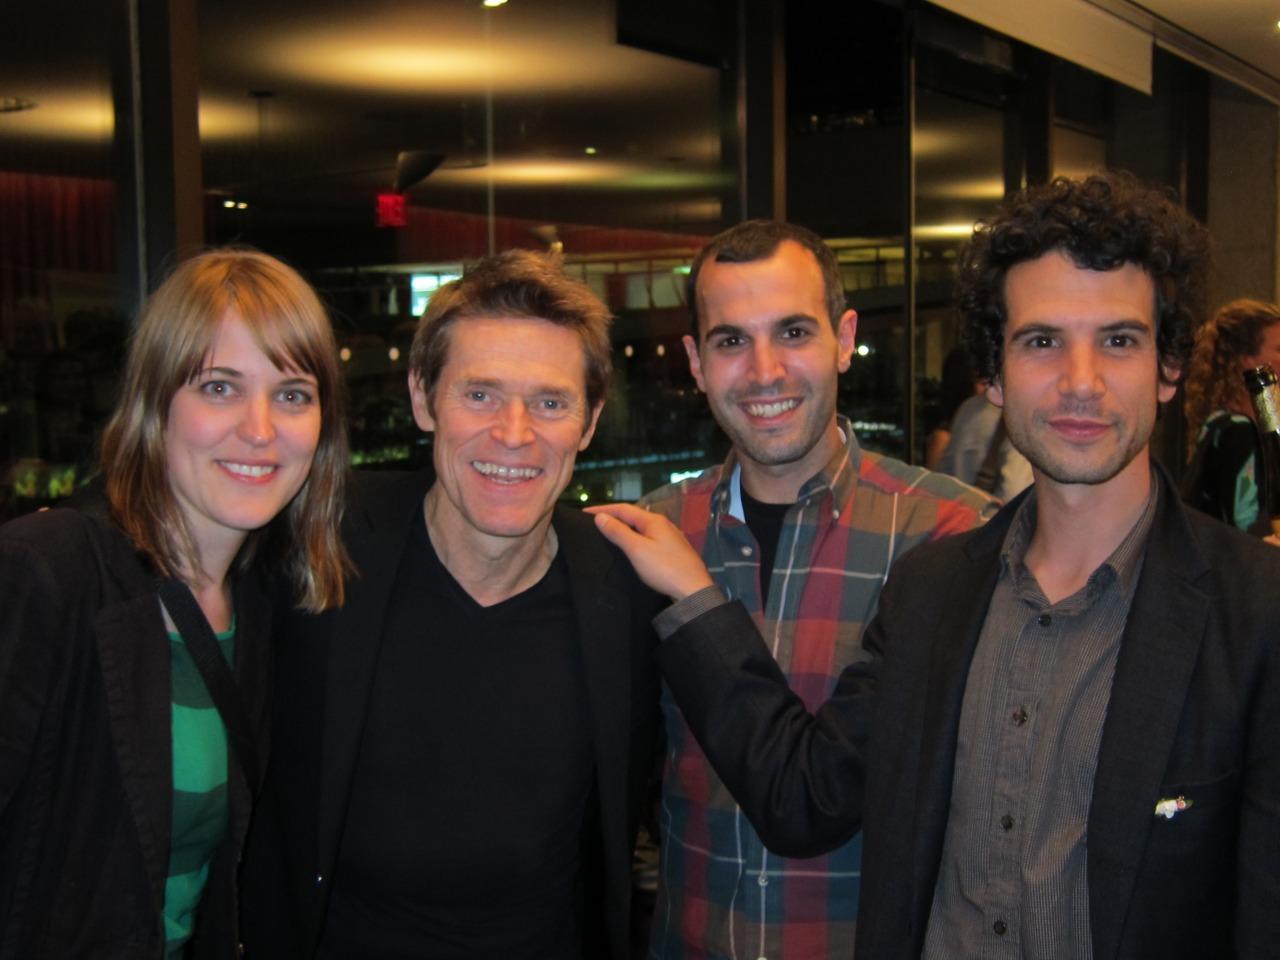 Lori Felker, Willem Dafoe, Fern Silva, Jonathan Schwartz NY Film Festival, Oct. 2011